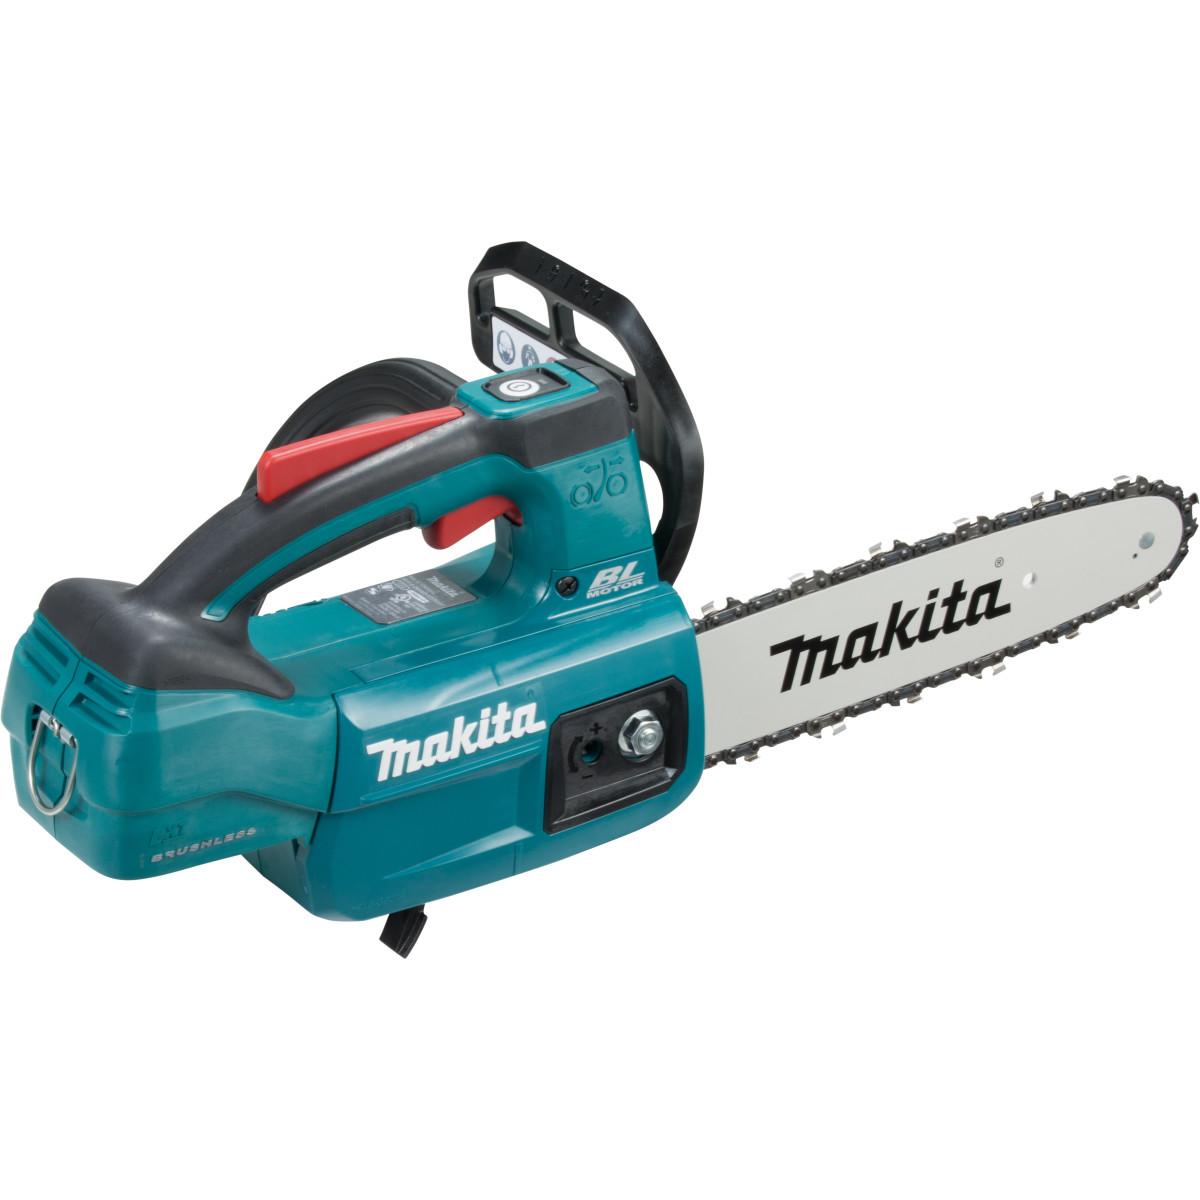 "Makita DUC254Z 18V Brushless Chainsaw 250mm (10"")"